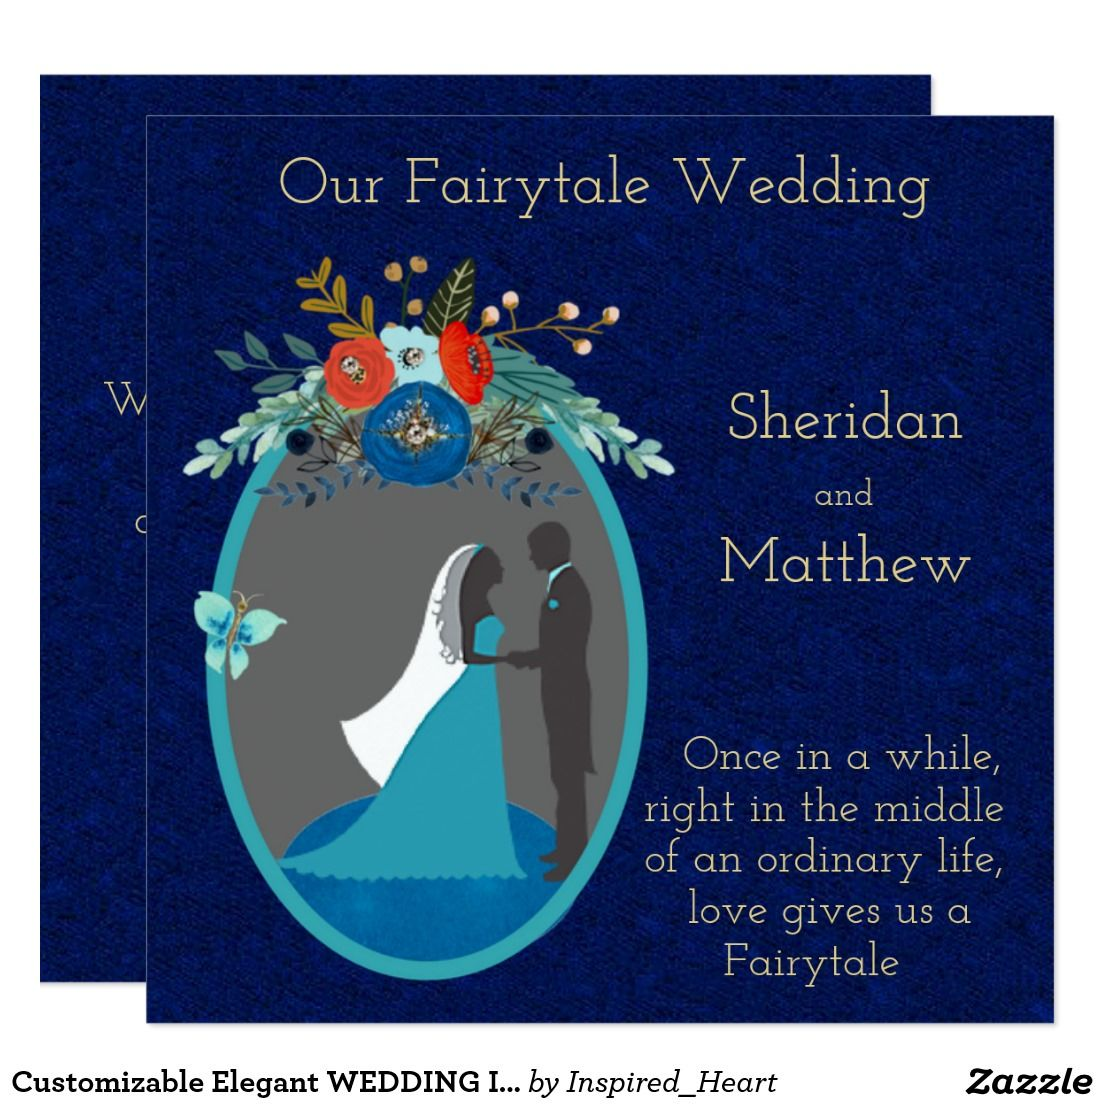 Customizable Elegant WEDDING INVITATION | Customizable Wedding ...